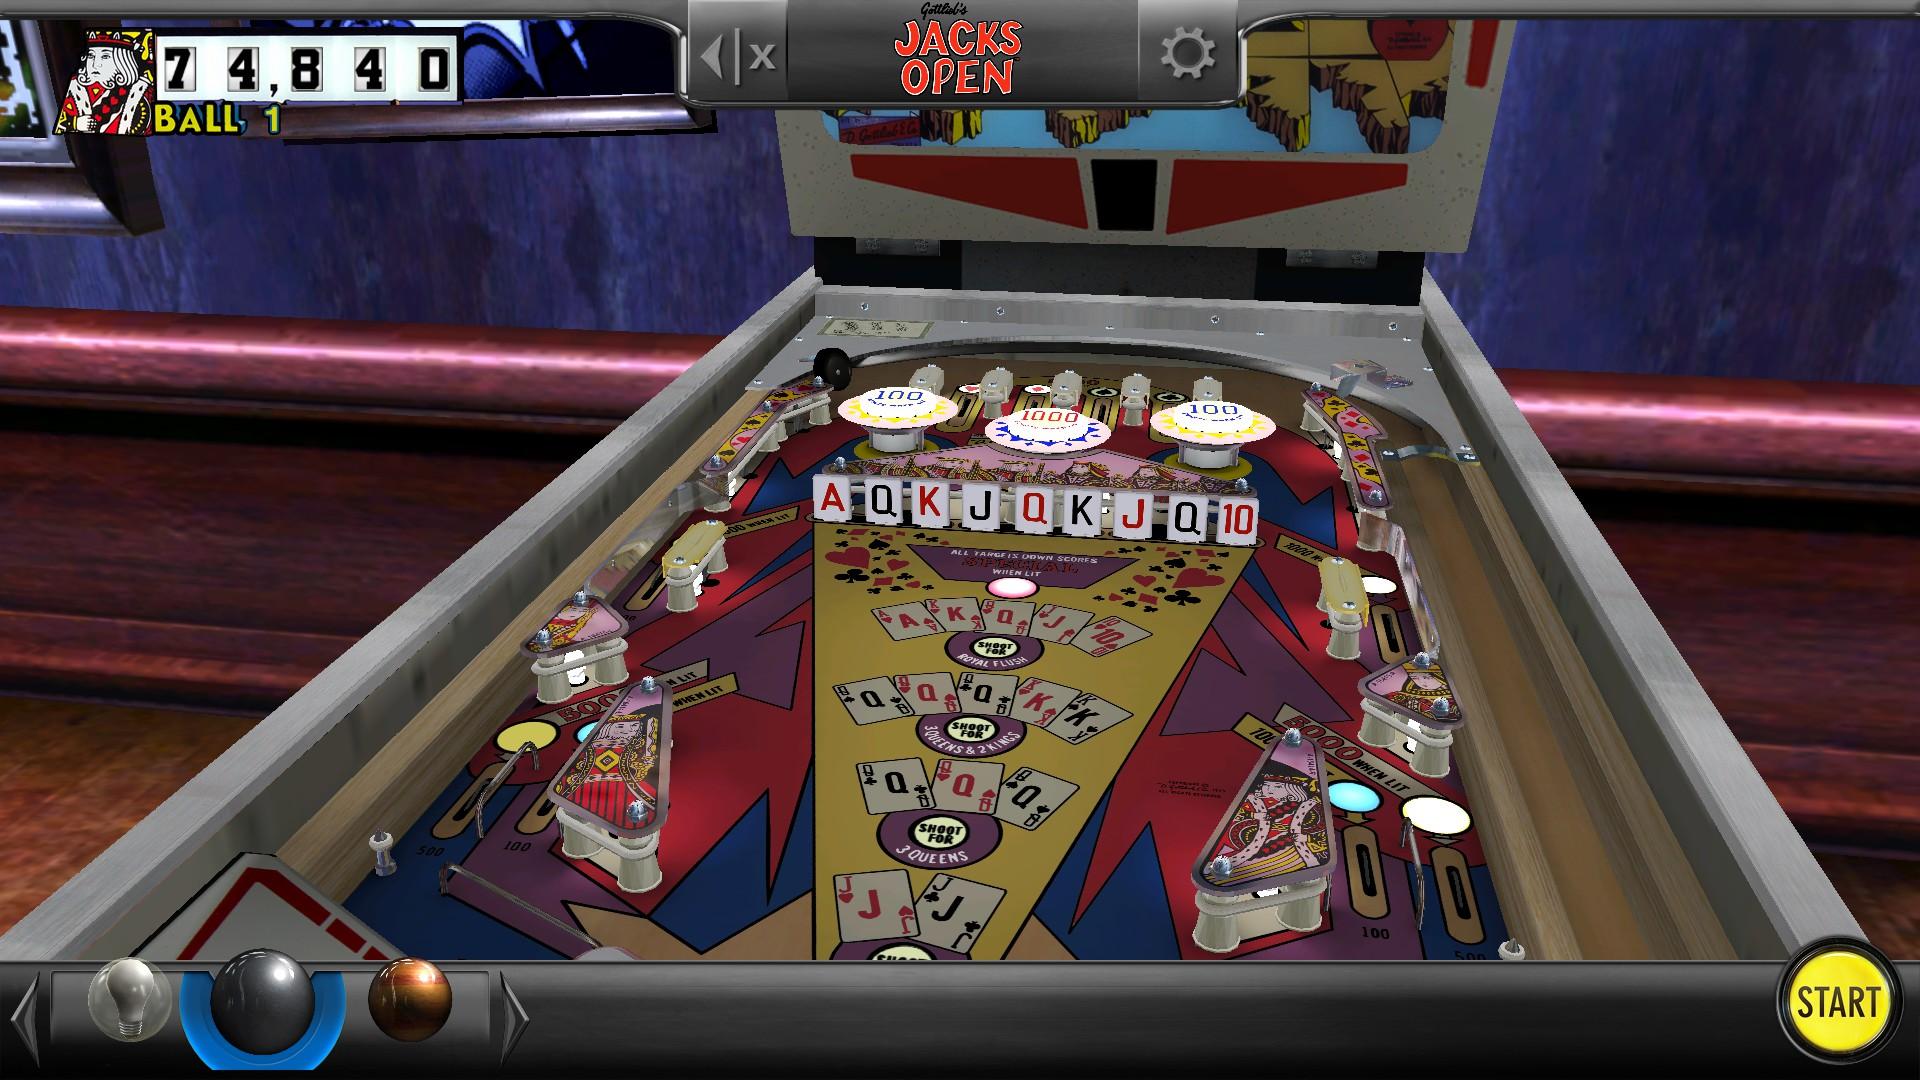 Mantalow: Pinball Arcade: Jacks Open (PC) 174,840 points on 2016-11-27 11:52:07